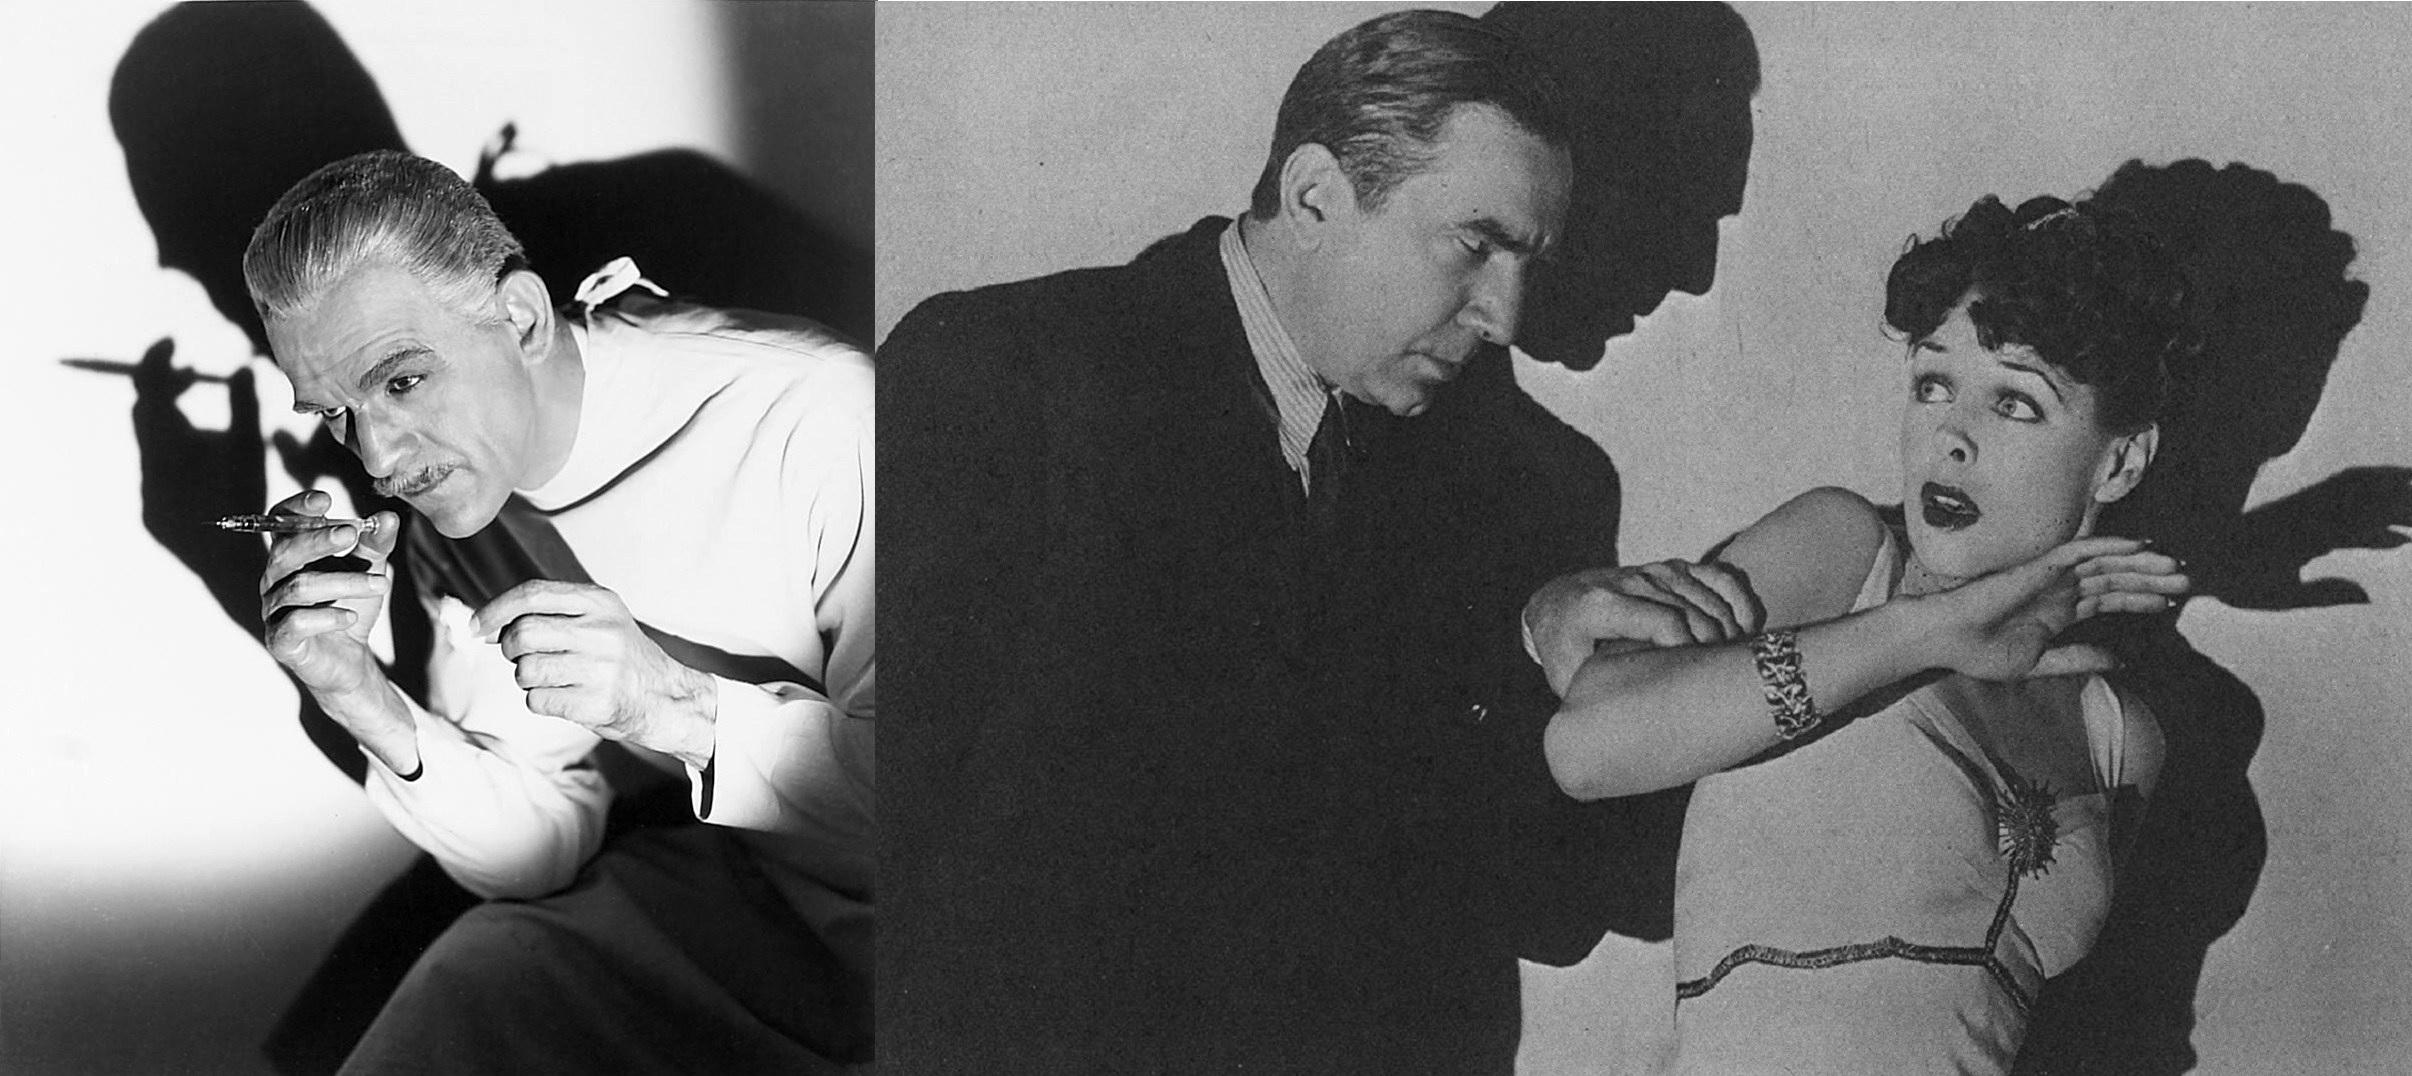 Boris Karloff, Bela Lugosi, Anna Nagel in Black Friday (1940)